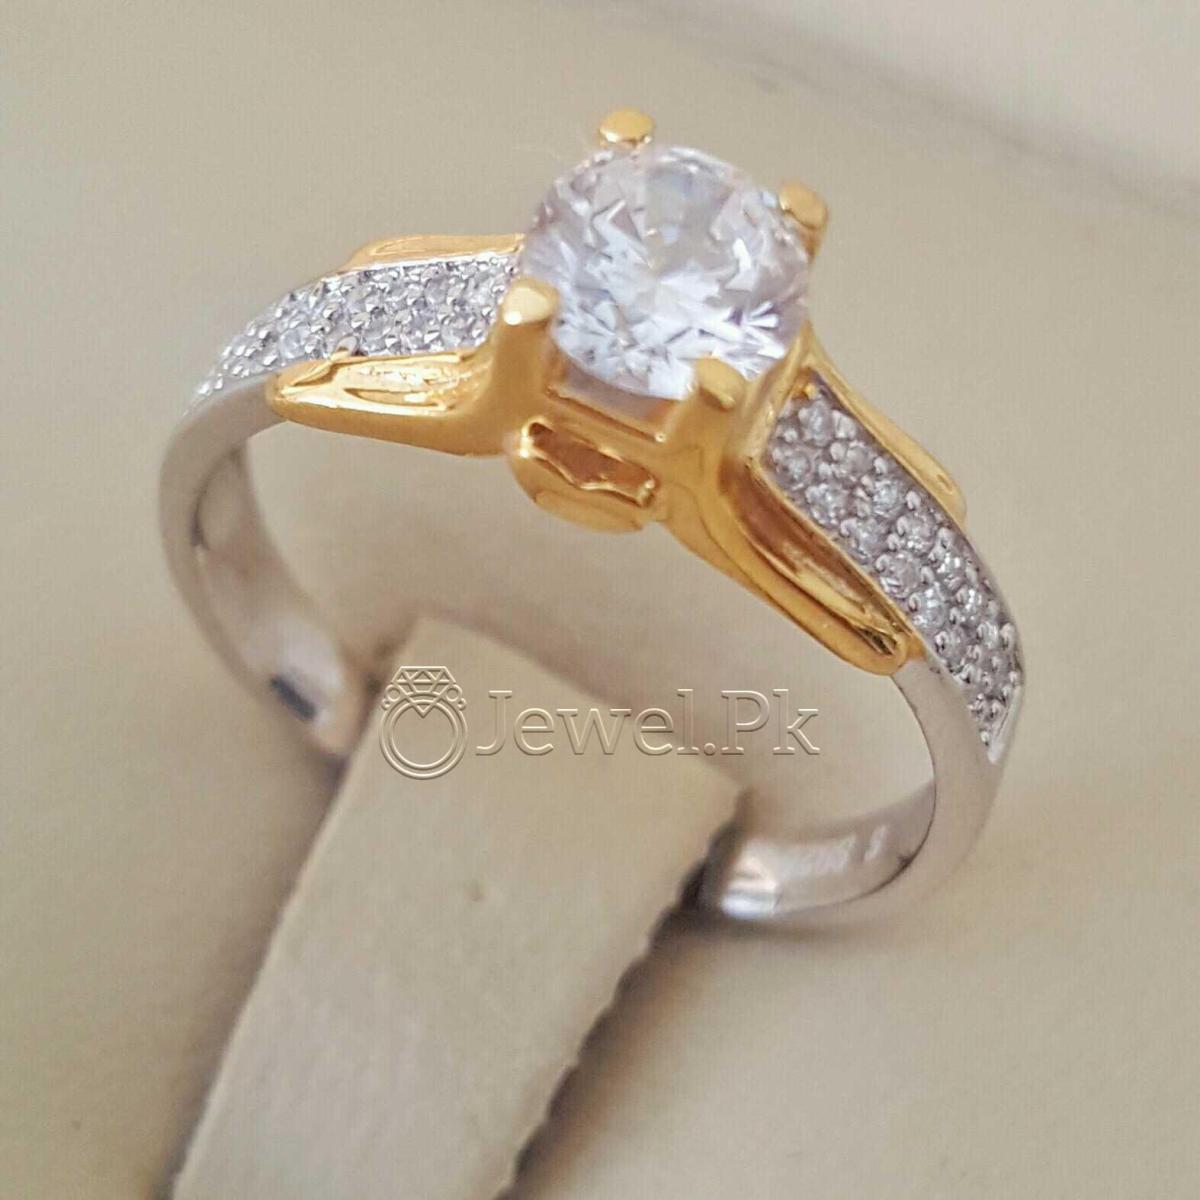 925 Silver Luxury Rings for Ladies Women Silver Rings Woman Handmade Rings 38 natural gemstones pakistan + 925 silver jewelry online